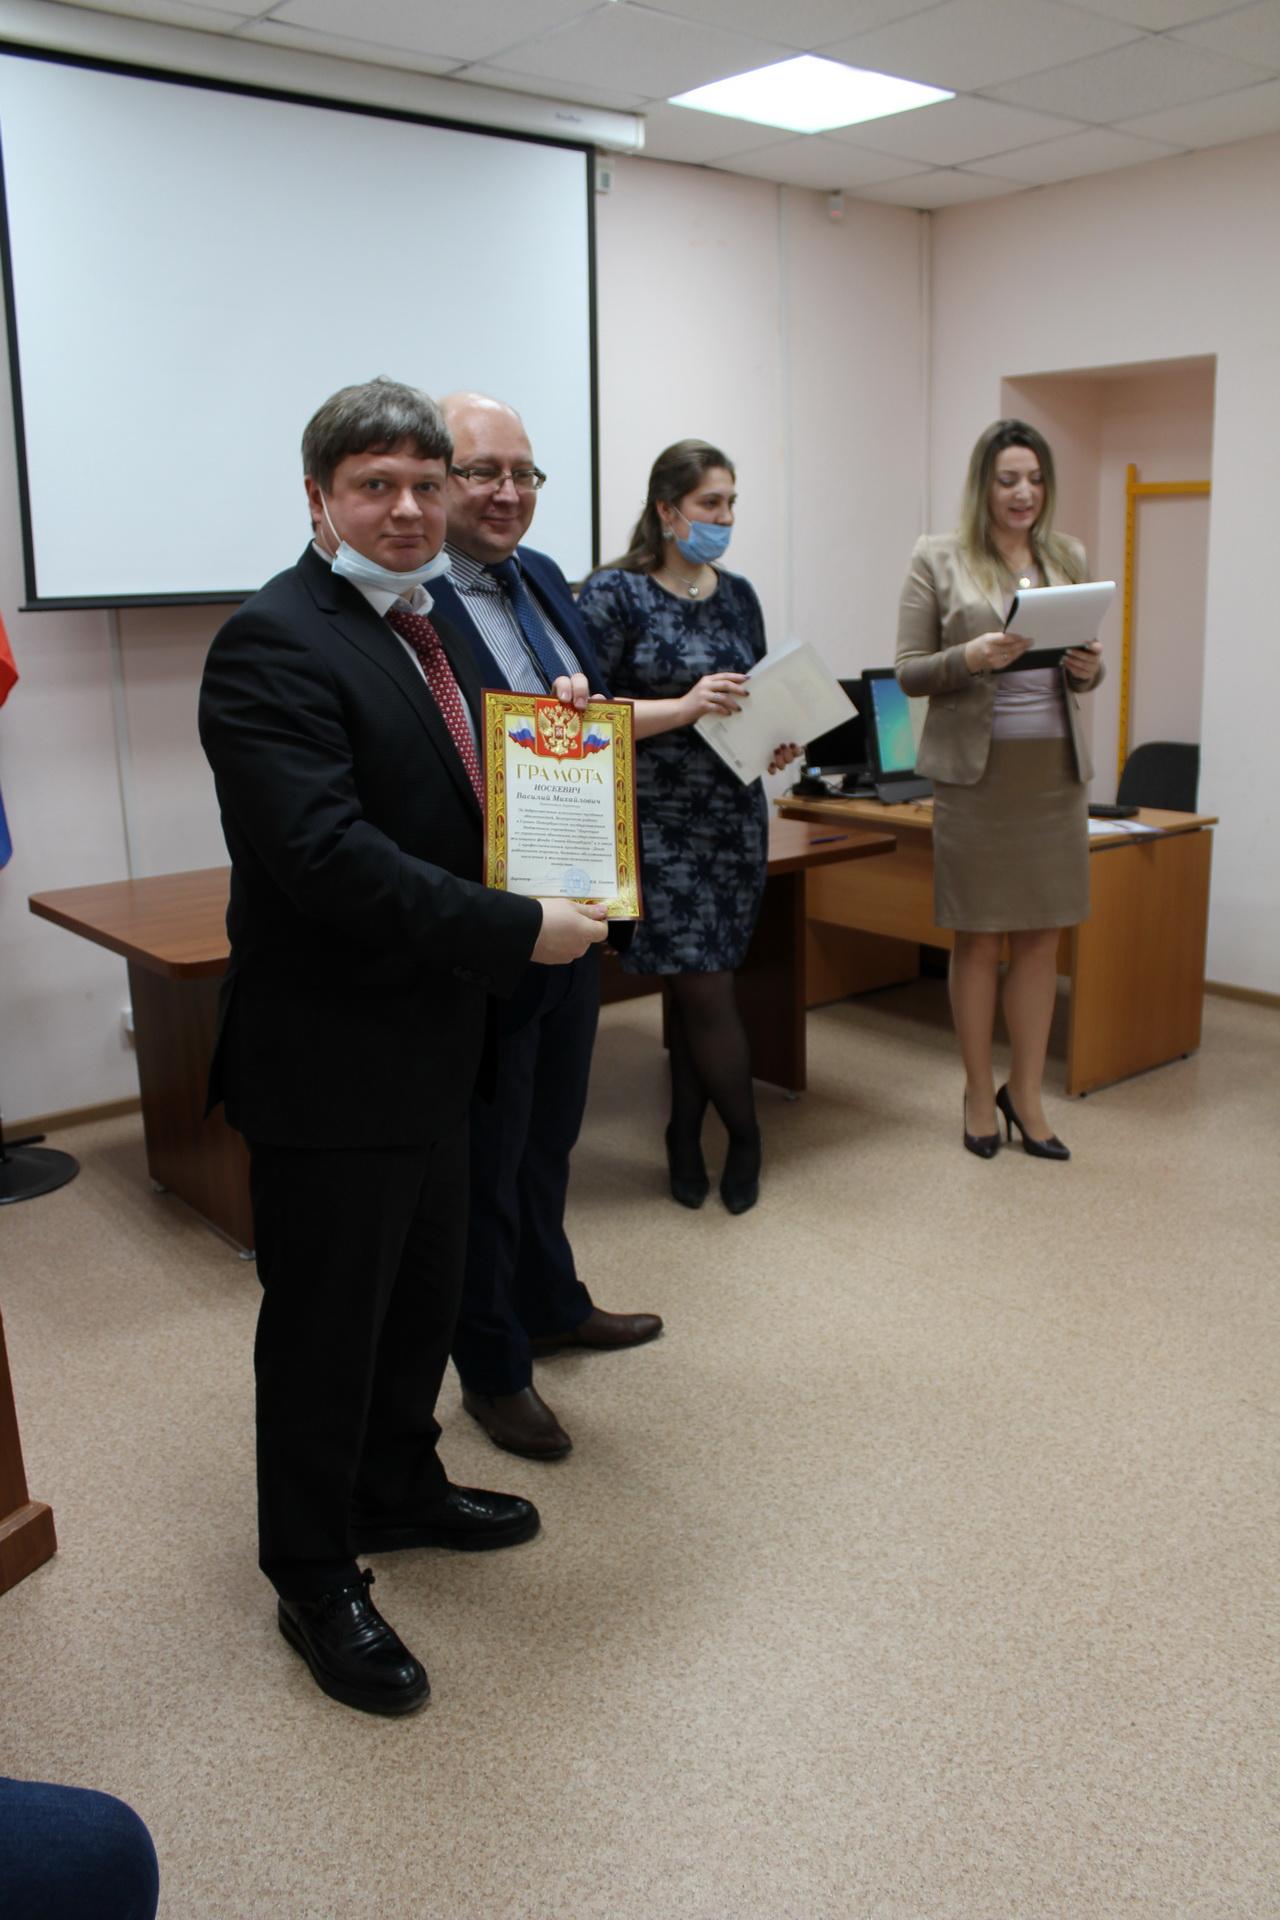 Лучшим работникам ЖКХ вручили награды